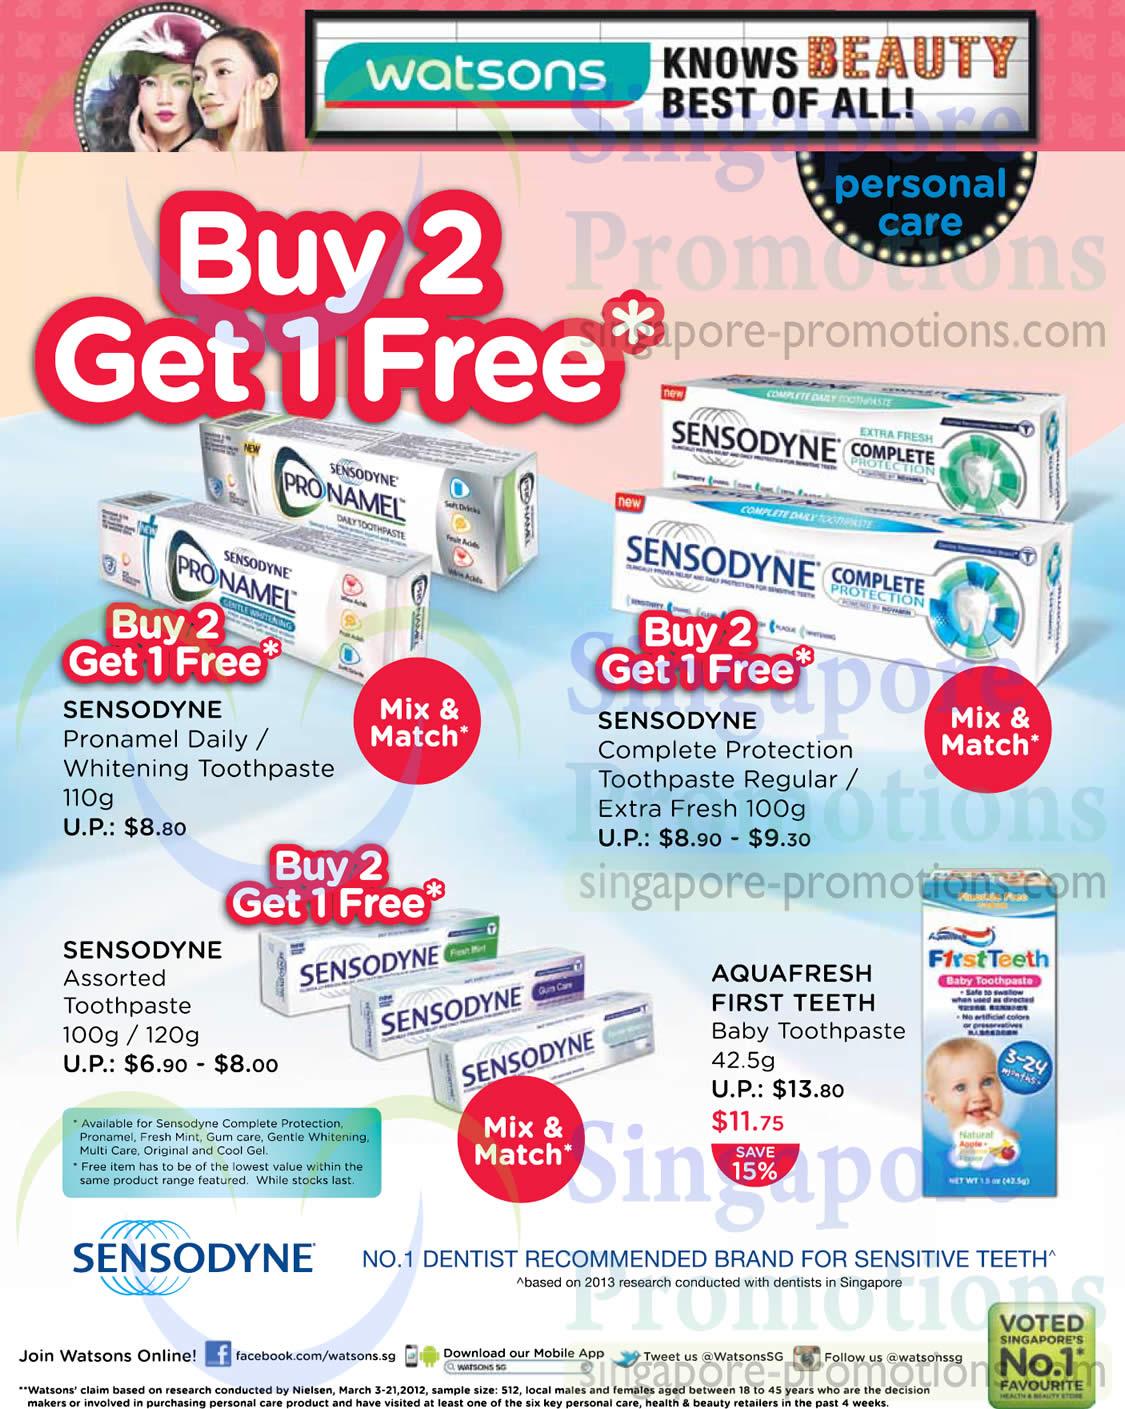 Sensodyne Toothpaste Buy 2 Get 1 Free